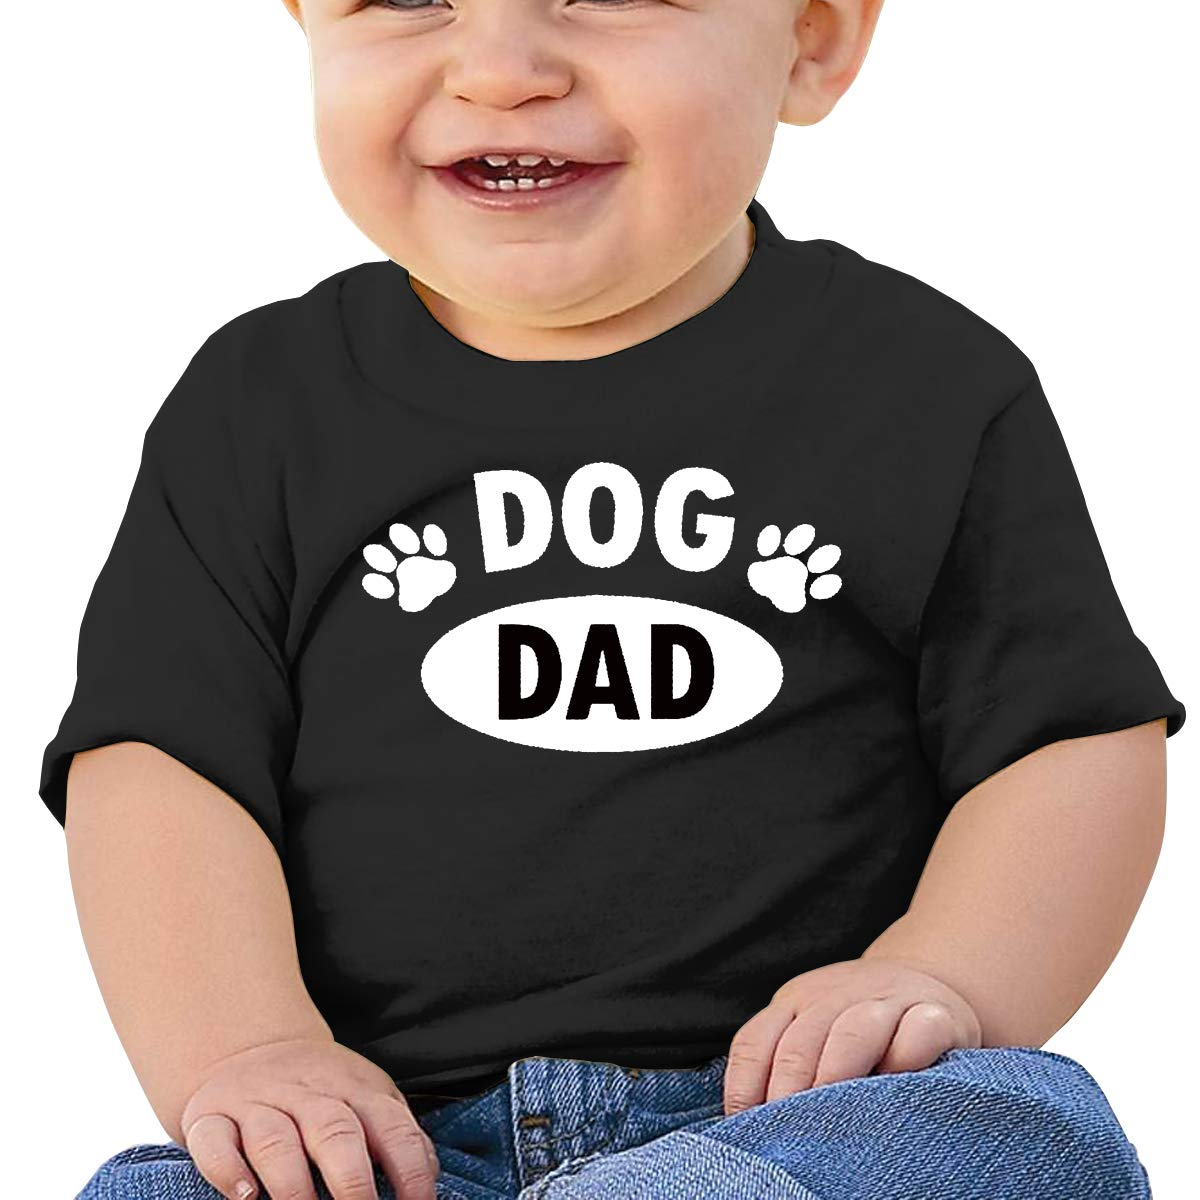 Paw Dog Dad Toddler Short-Sleeve Tee for Boy Girl Infant Kids T-Shirt On Newborn 6-18 Months